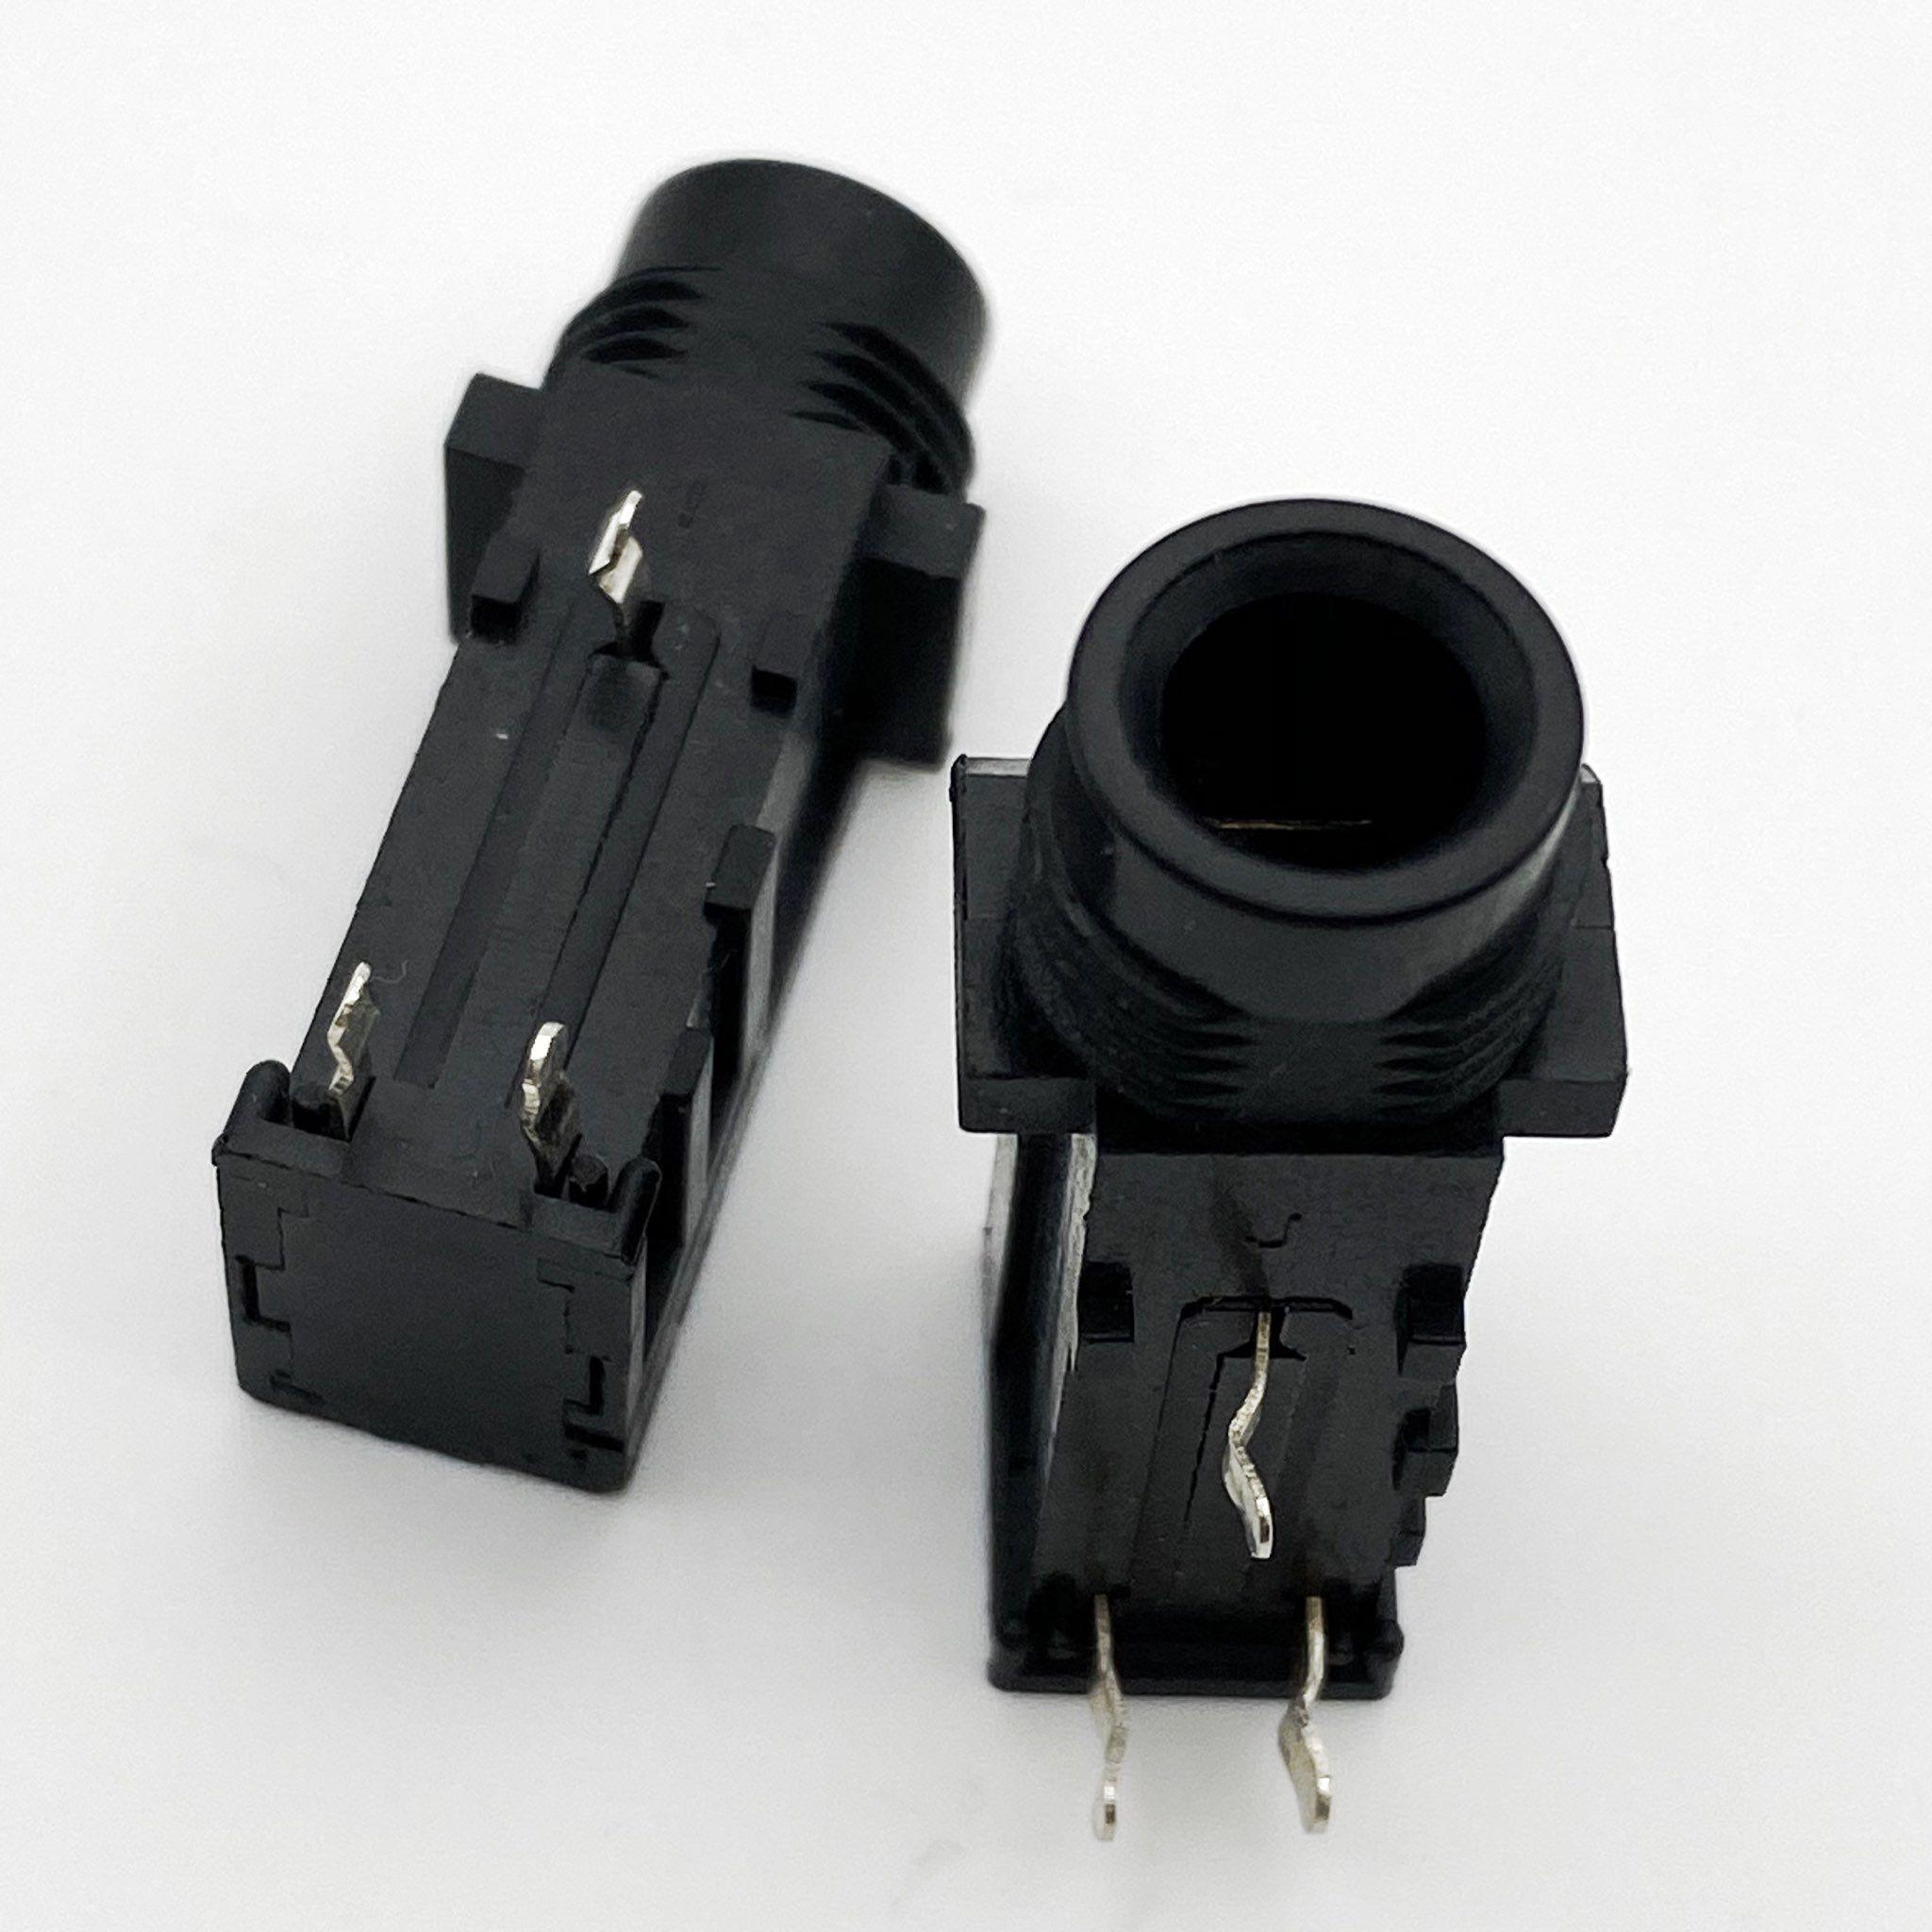 Audio Jack 3 PIN ø6.35mm